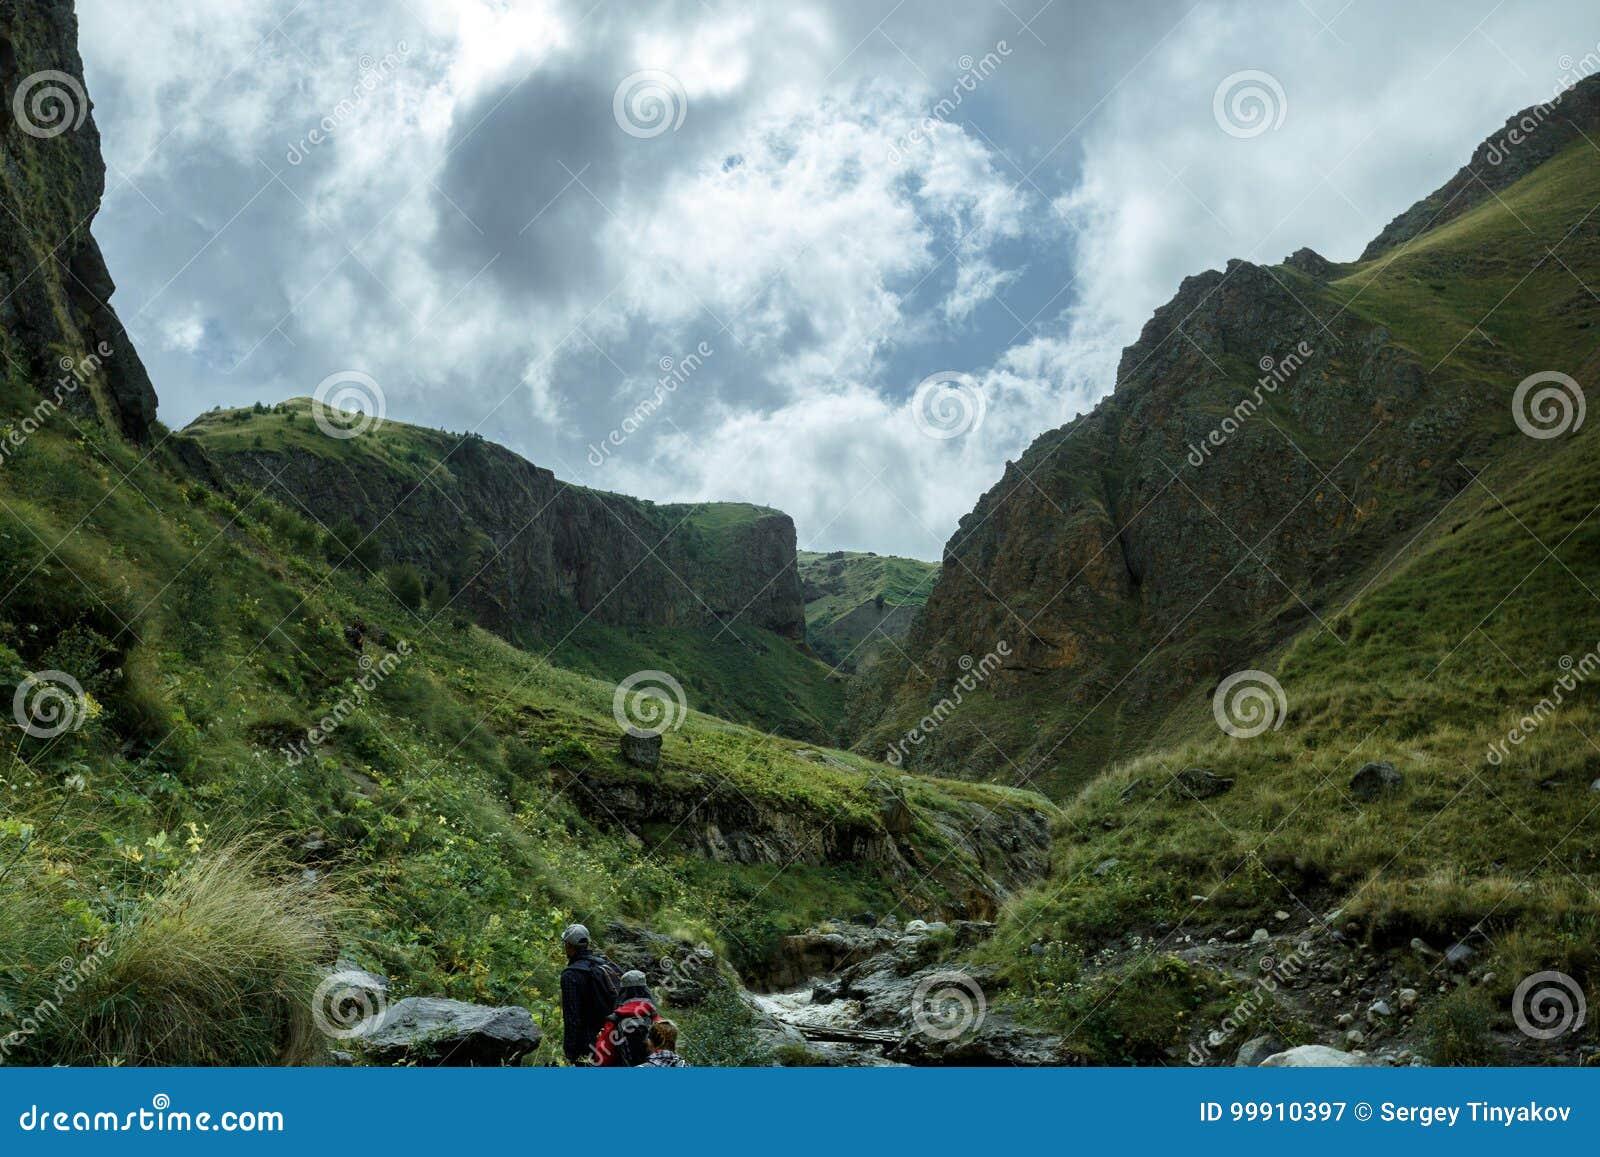 Group Of Travelers Walking Along In Summer Mountains, Journey Travel Trek Concept